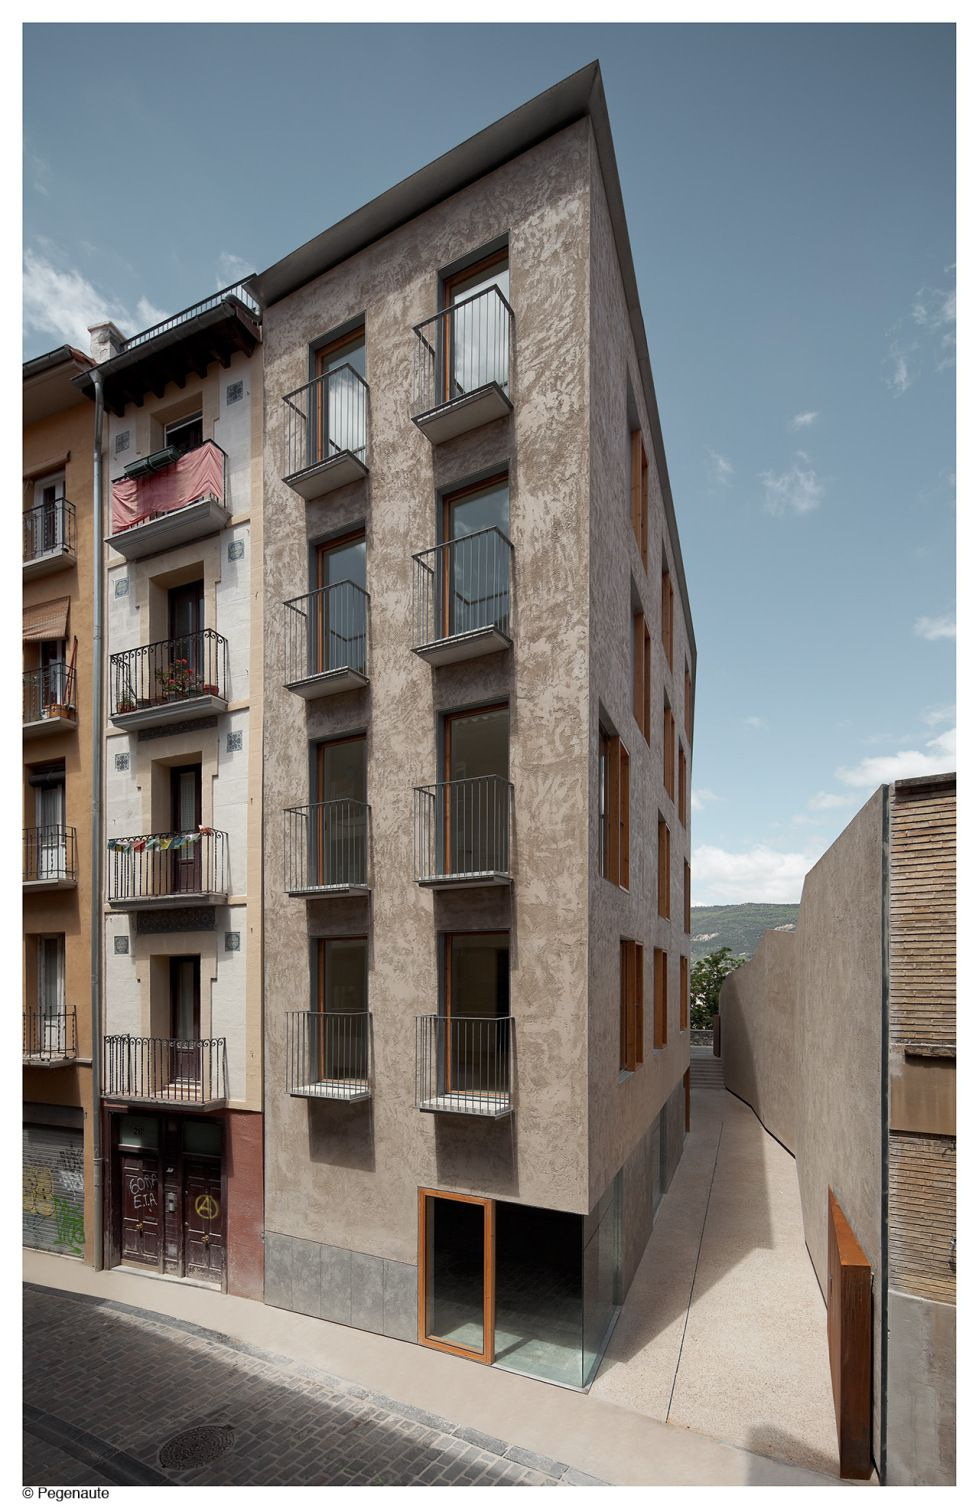 Hic arquitectura pereda p rez arquitectos edificio de viviendas en la calle descalzos - Arquitectos en pamplona ...